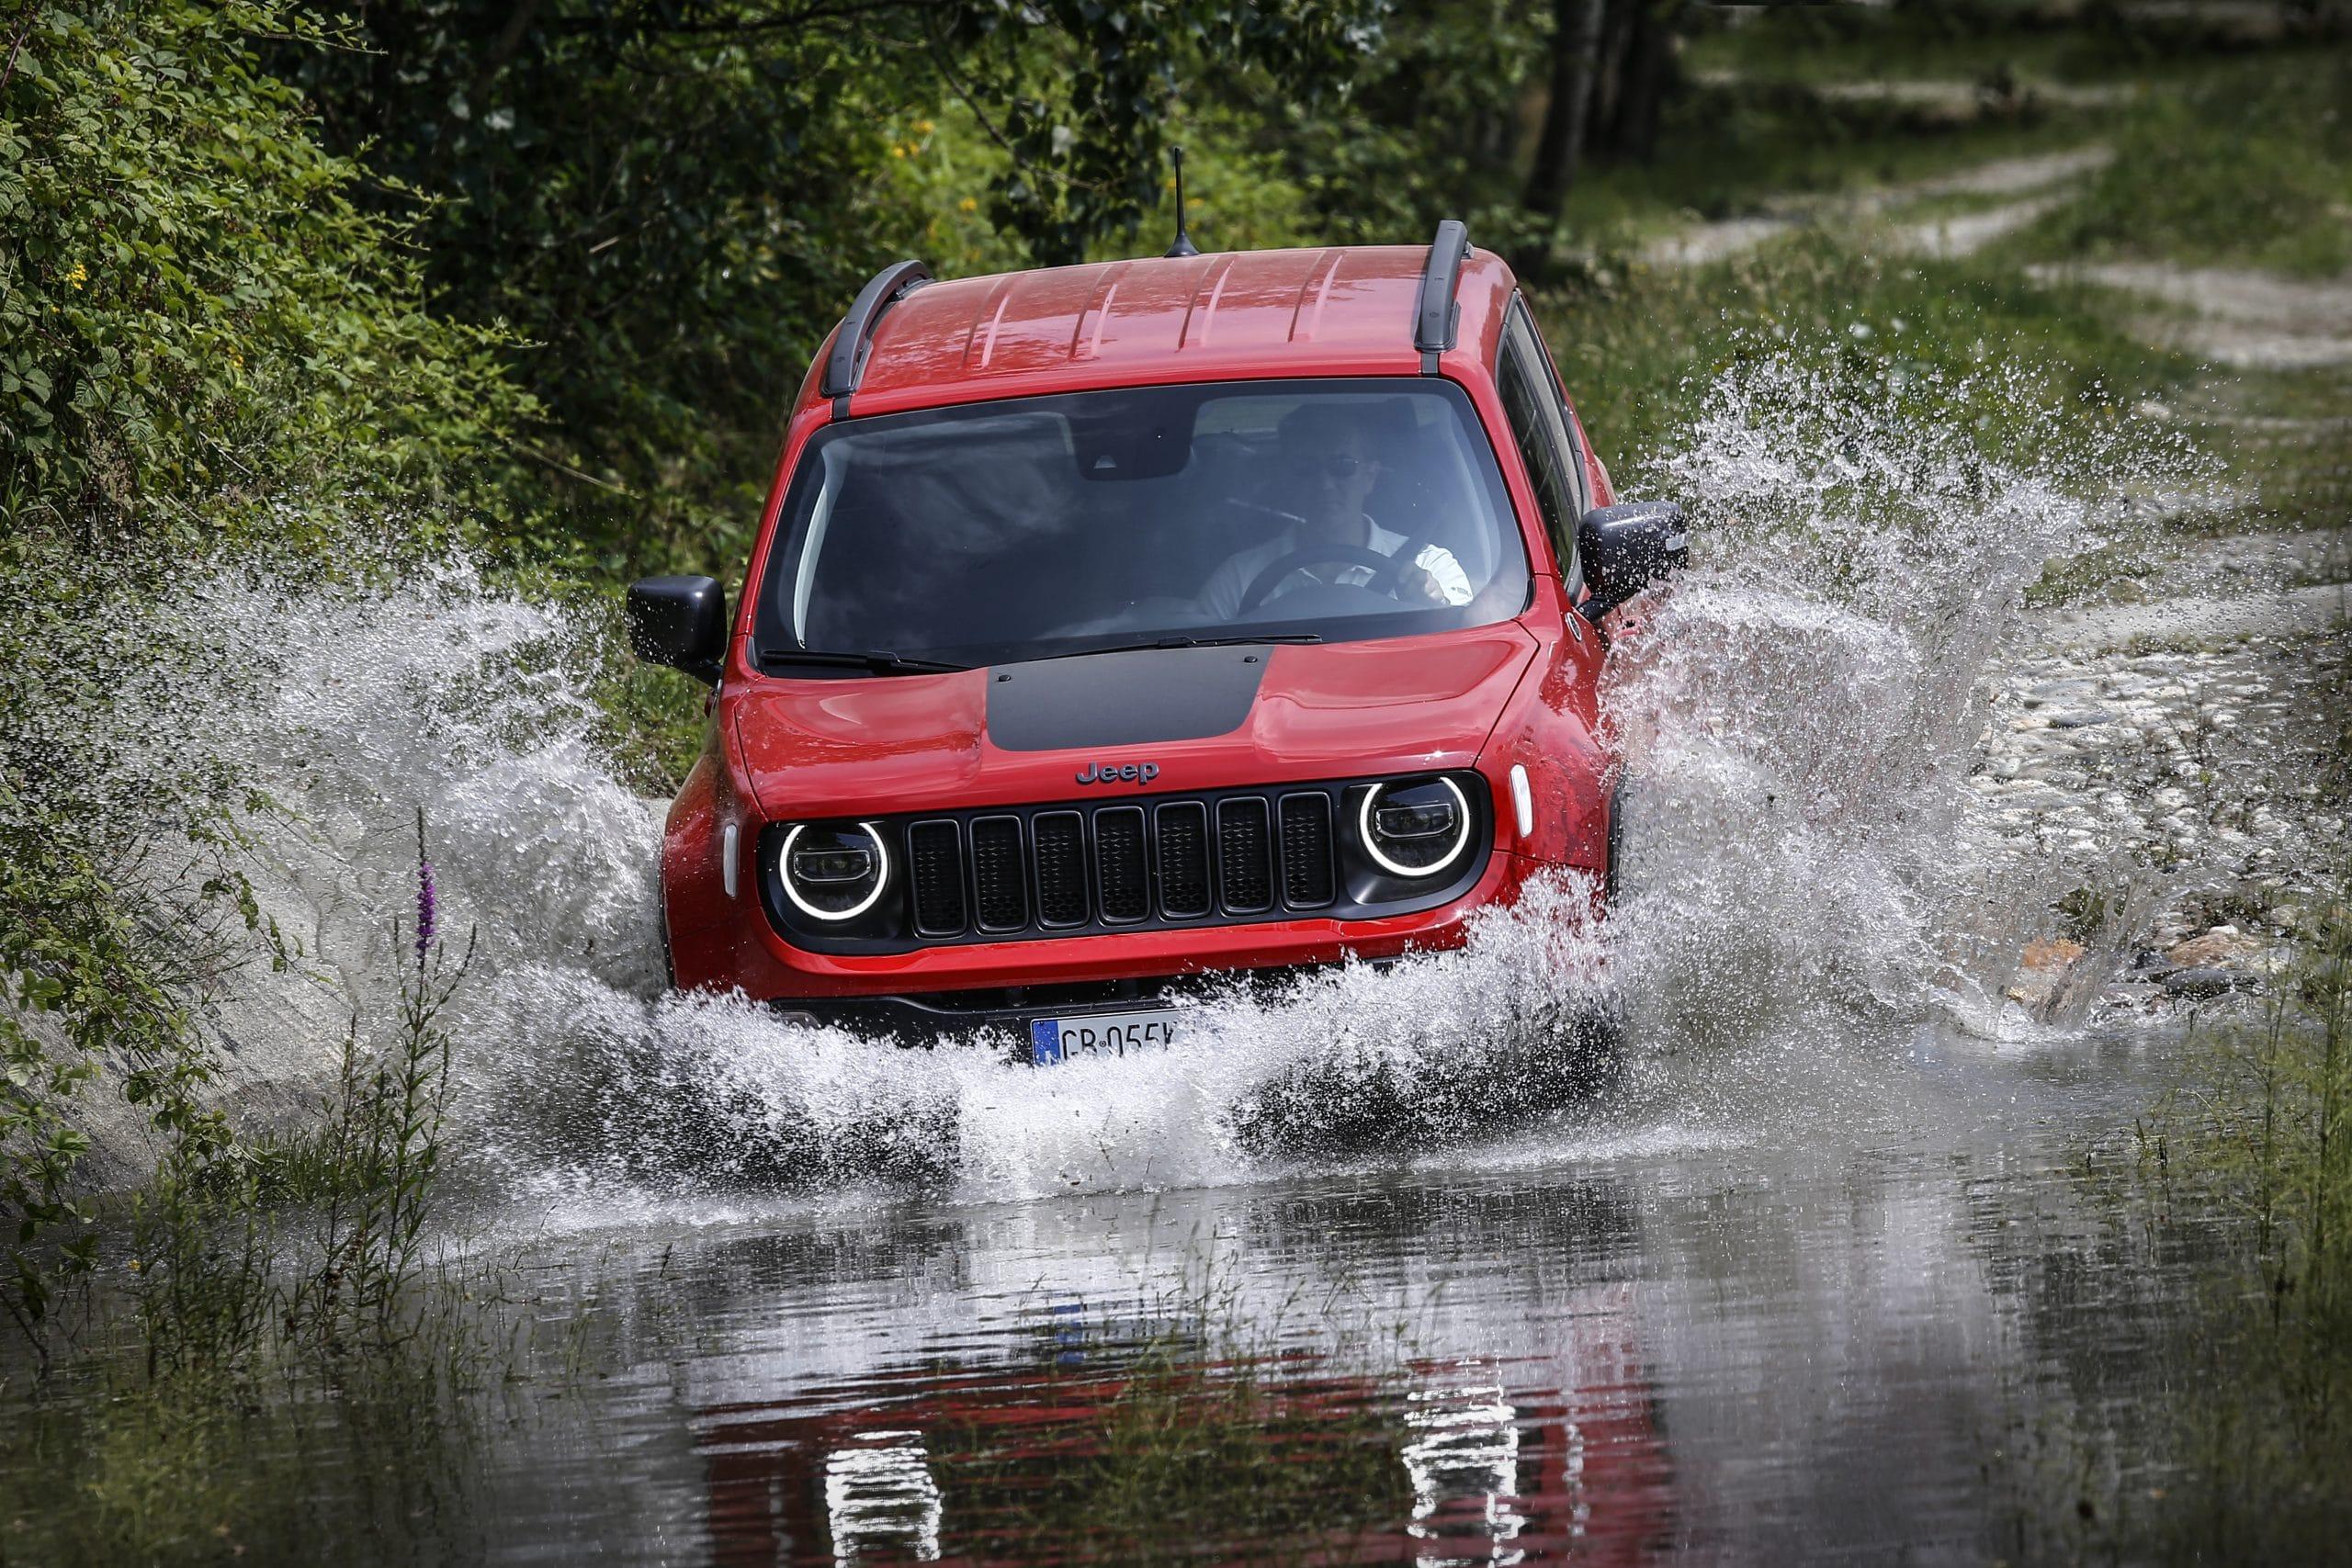 Jeep Renegade TH 4xe 65 scaled H Jeep πρωταγωνιστεί στα φετινά OFF ROAD Magazine Awards Gladiator, Jeep, Jeep Compass, Jeep Gladiator, Jeep Renegade, Jeep Wrangler, Renegade, Wrangler, ειδήσεις, Νέα